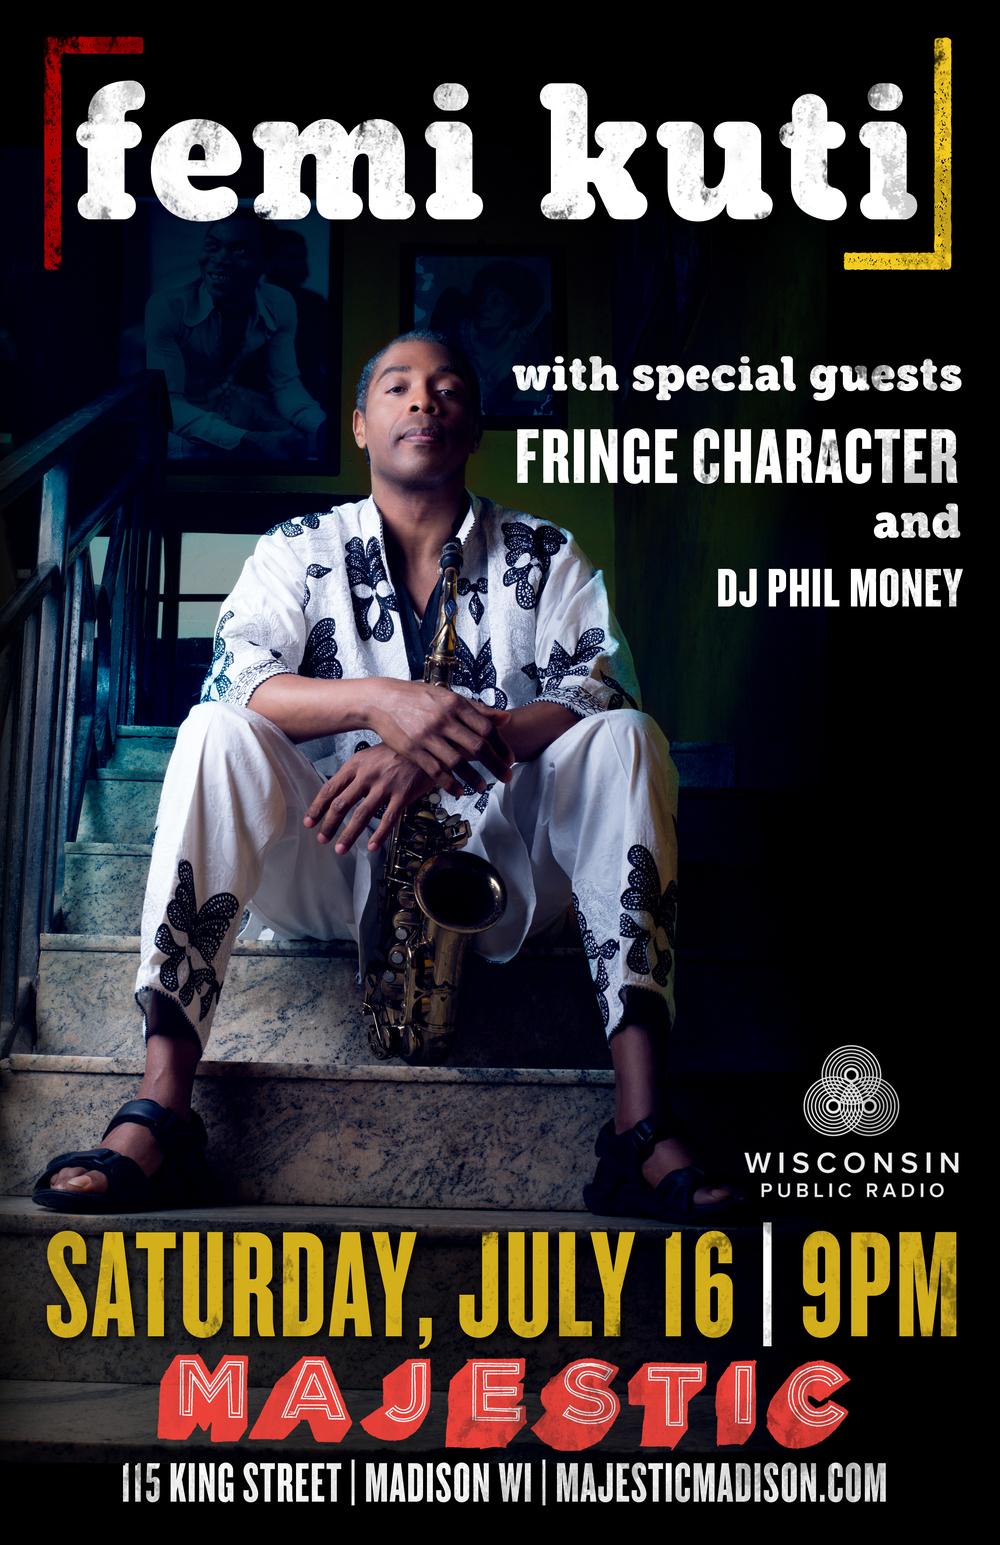 Femi Kuti | Fringe Character | DJ Phil Money